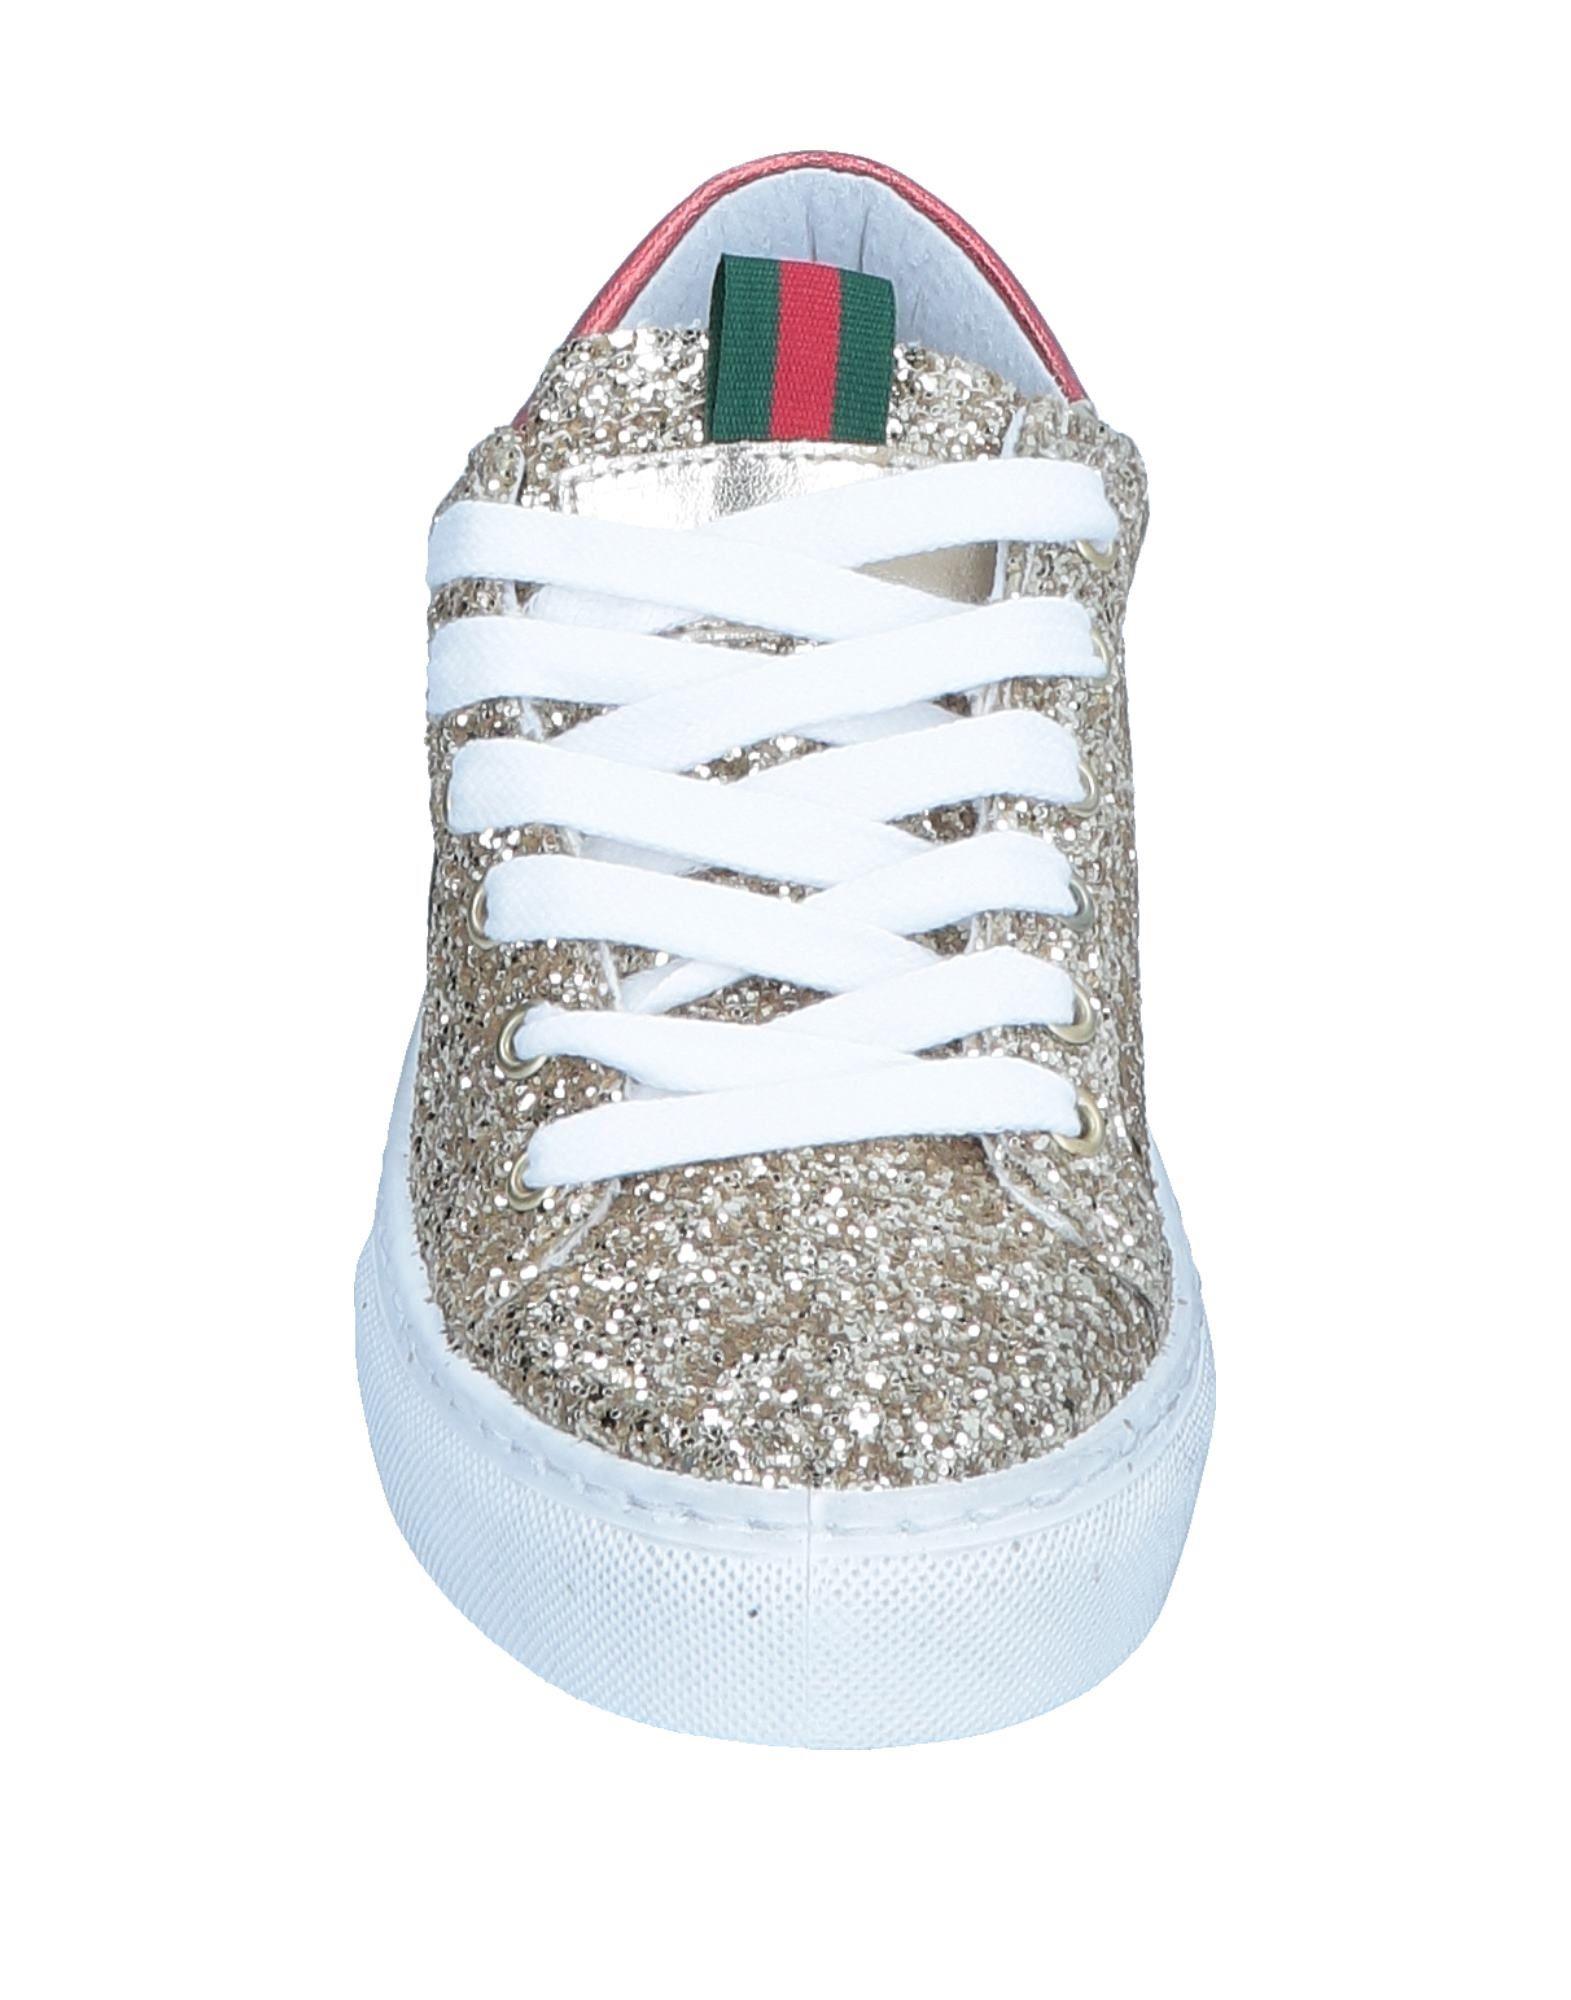 Ovye' By Cristina Lucchi Gute Sneakers Damen  11563407PK Gute Lucchi Qualität beliebte Schuhe 5153cd